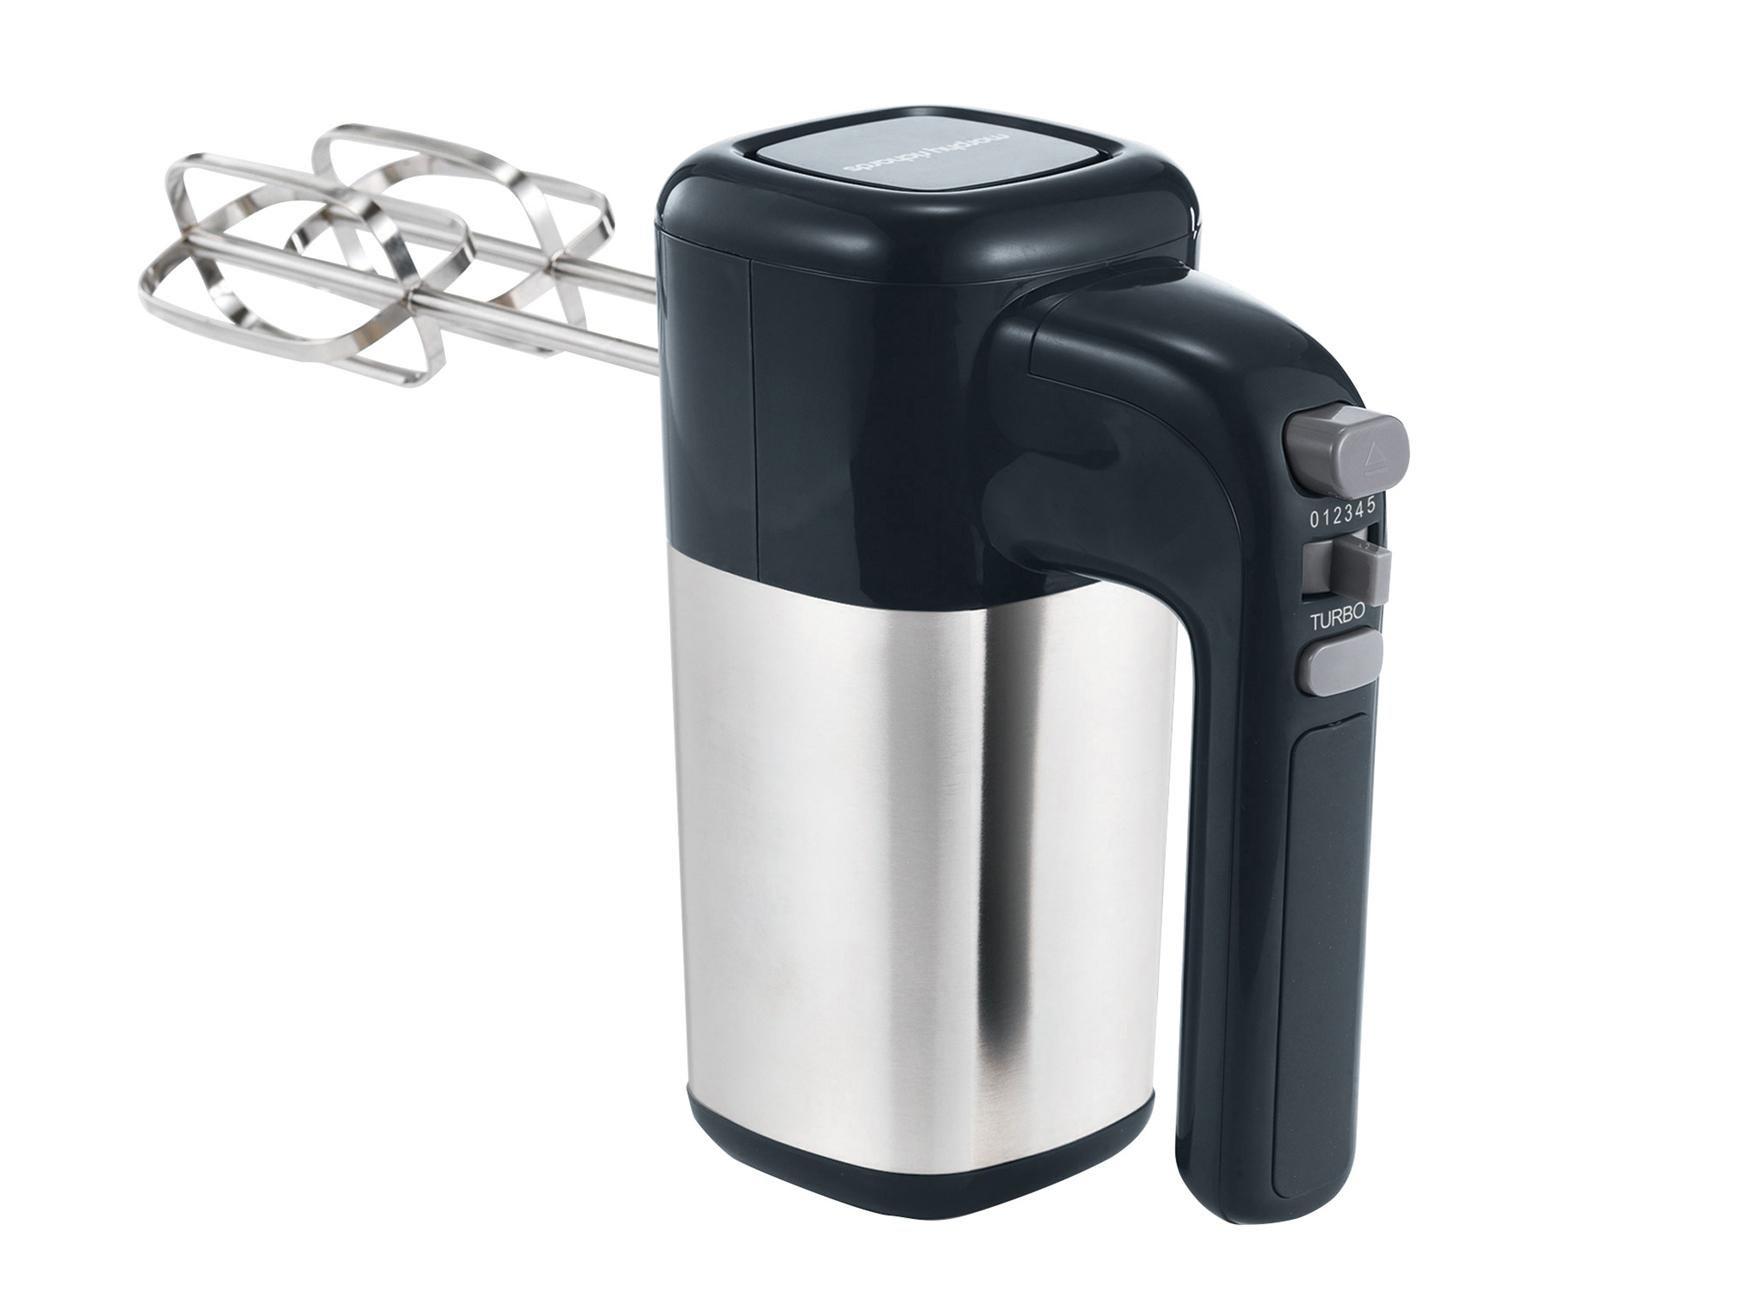 1 Liter Electric Kettles BakingReview